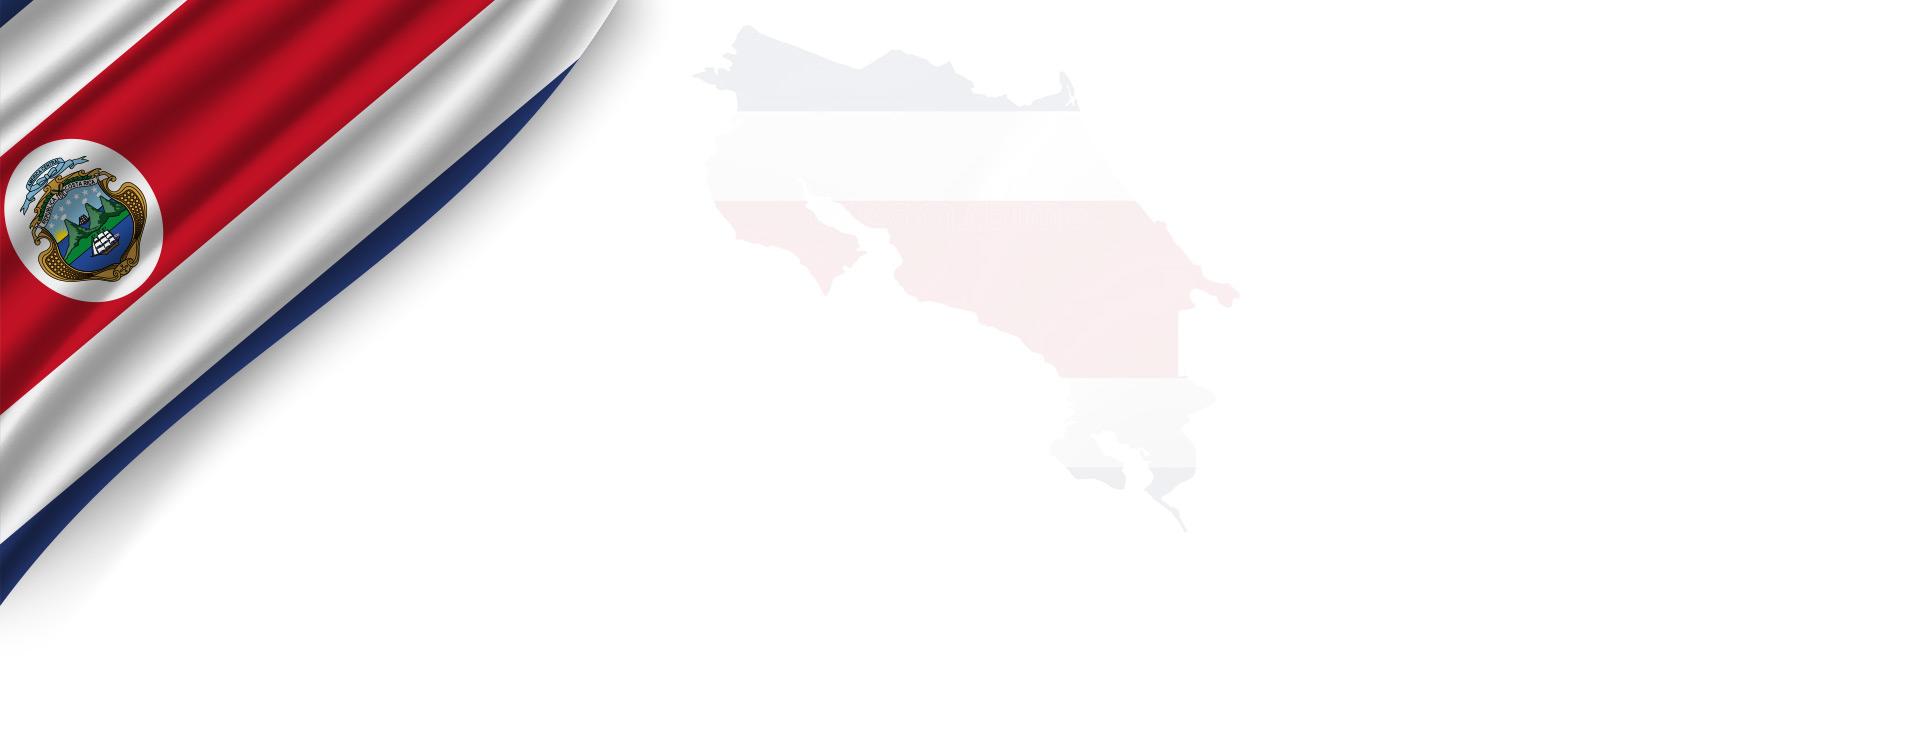 http://uned.ac.cr/sites/default/files/revslider/image/bicentenario_fondo.jpg